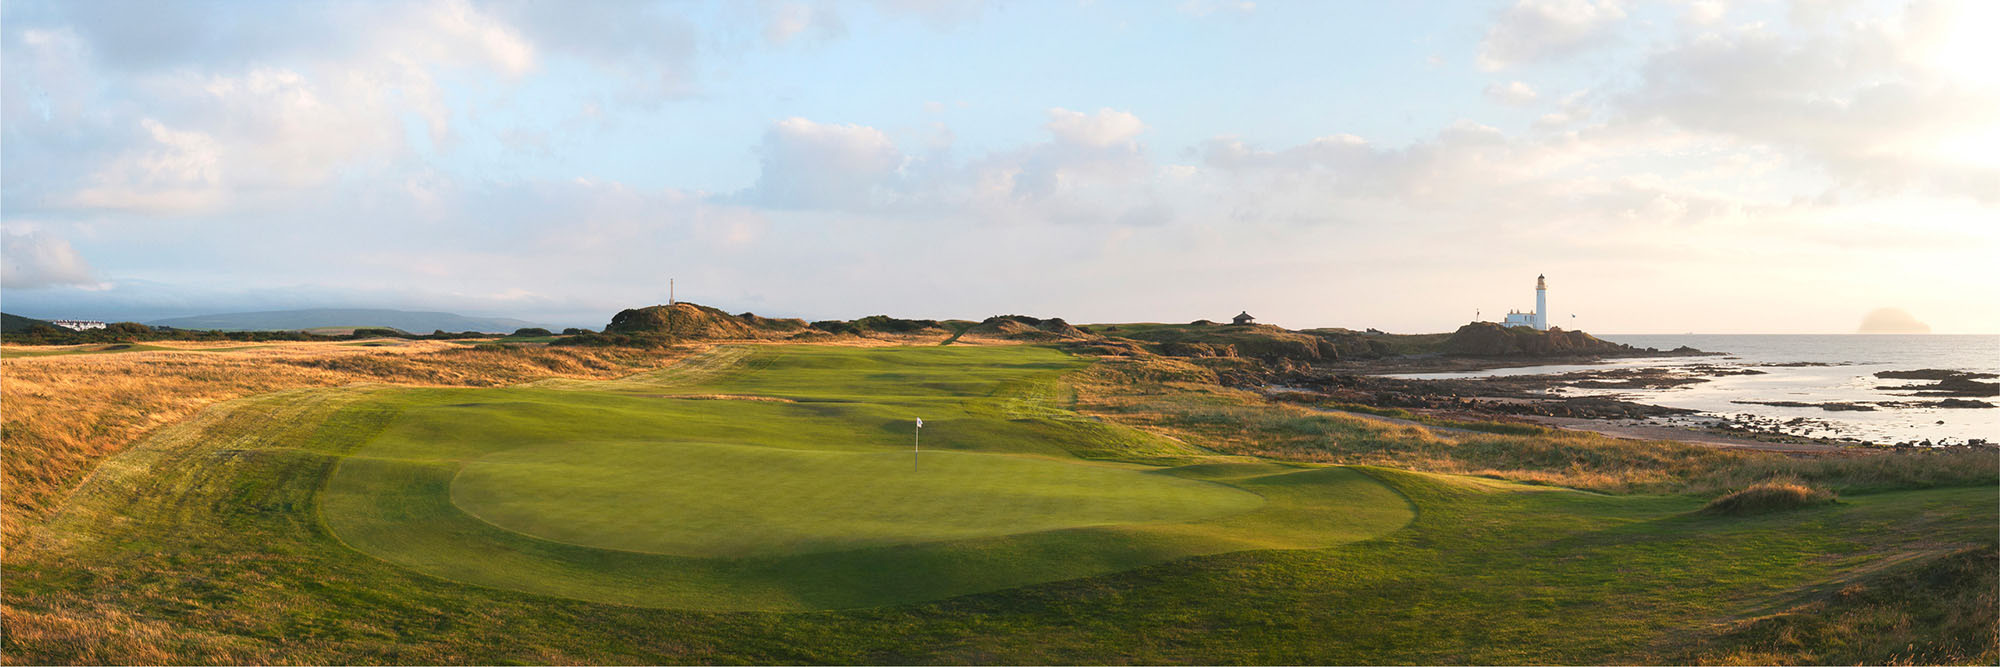 Golf Course Image - Turnberry Ailsa No. 10